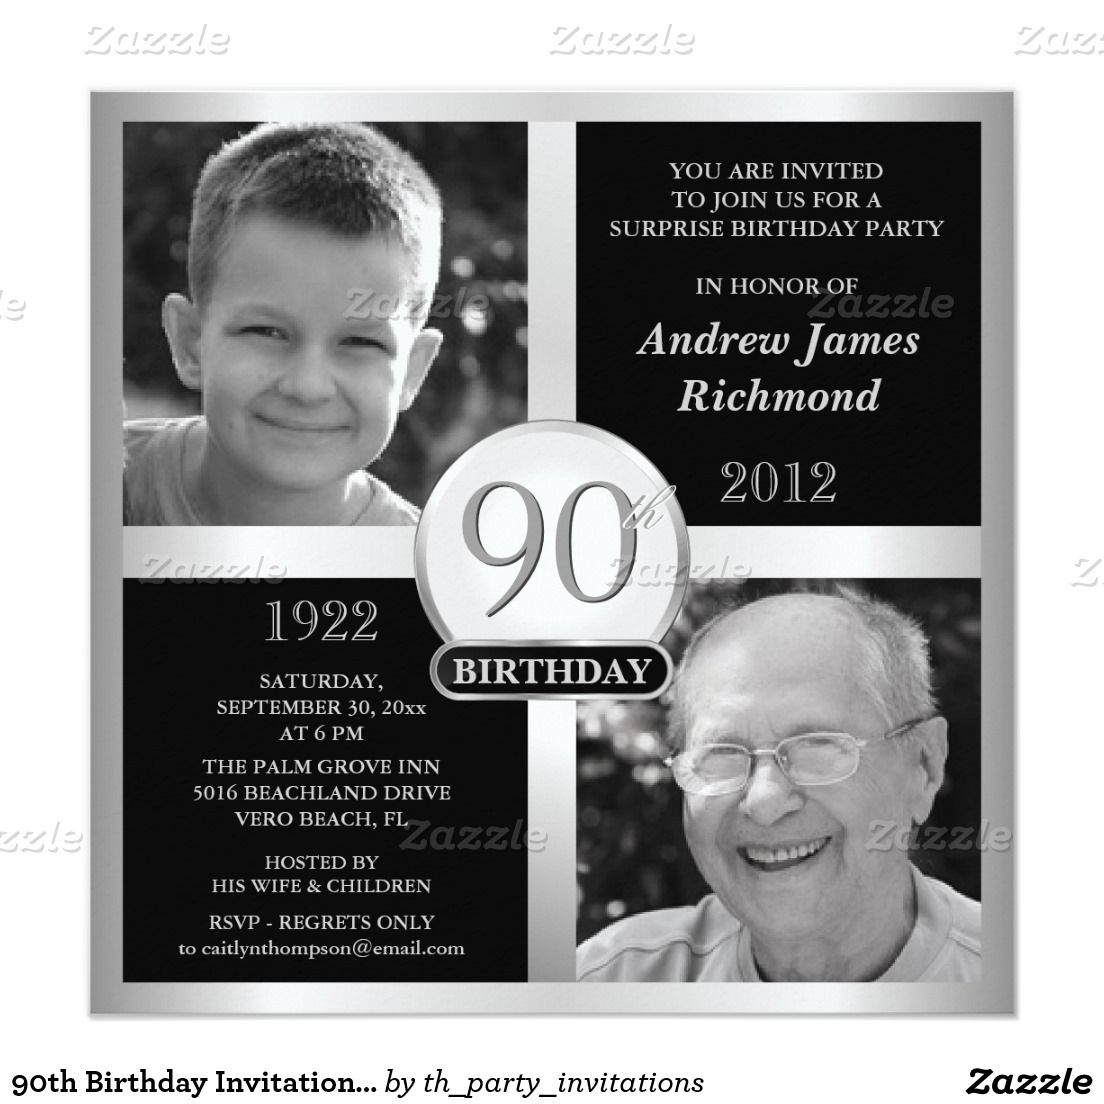 90th Birthday Invitations Then & Now 2 Photos | 90th birthday ...